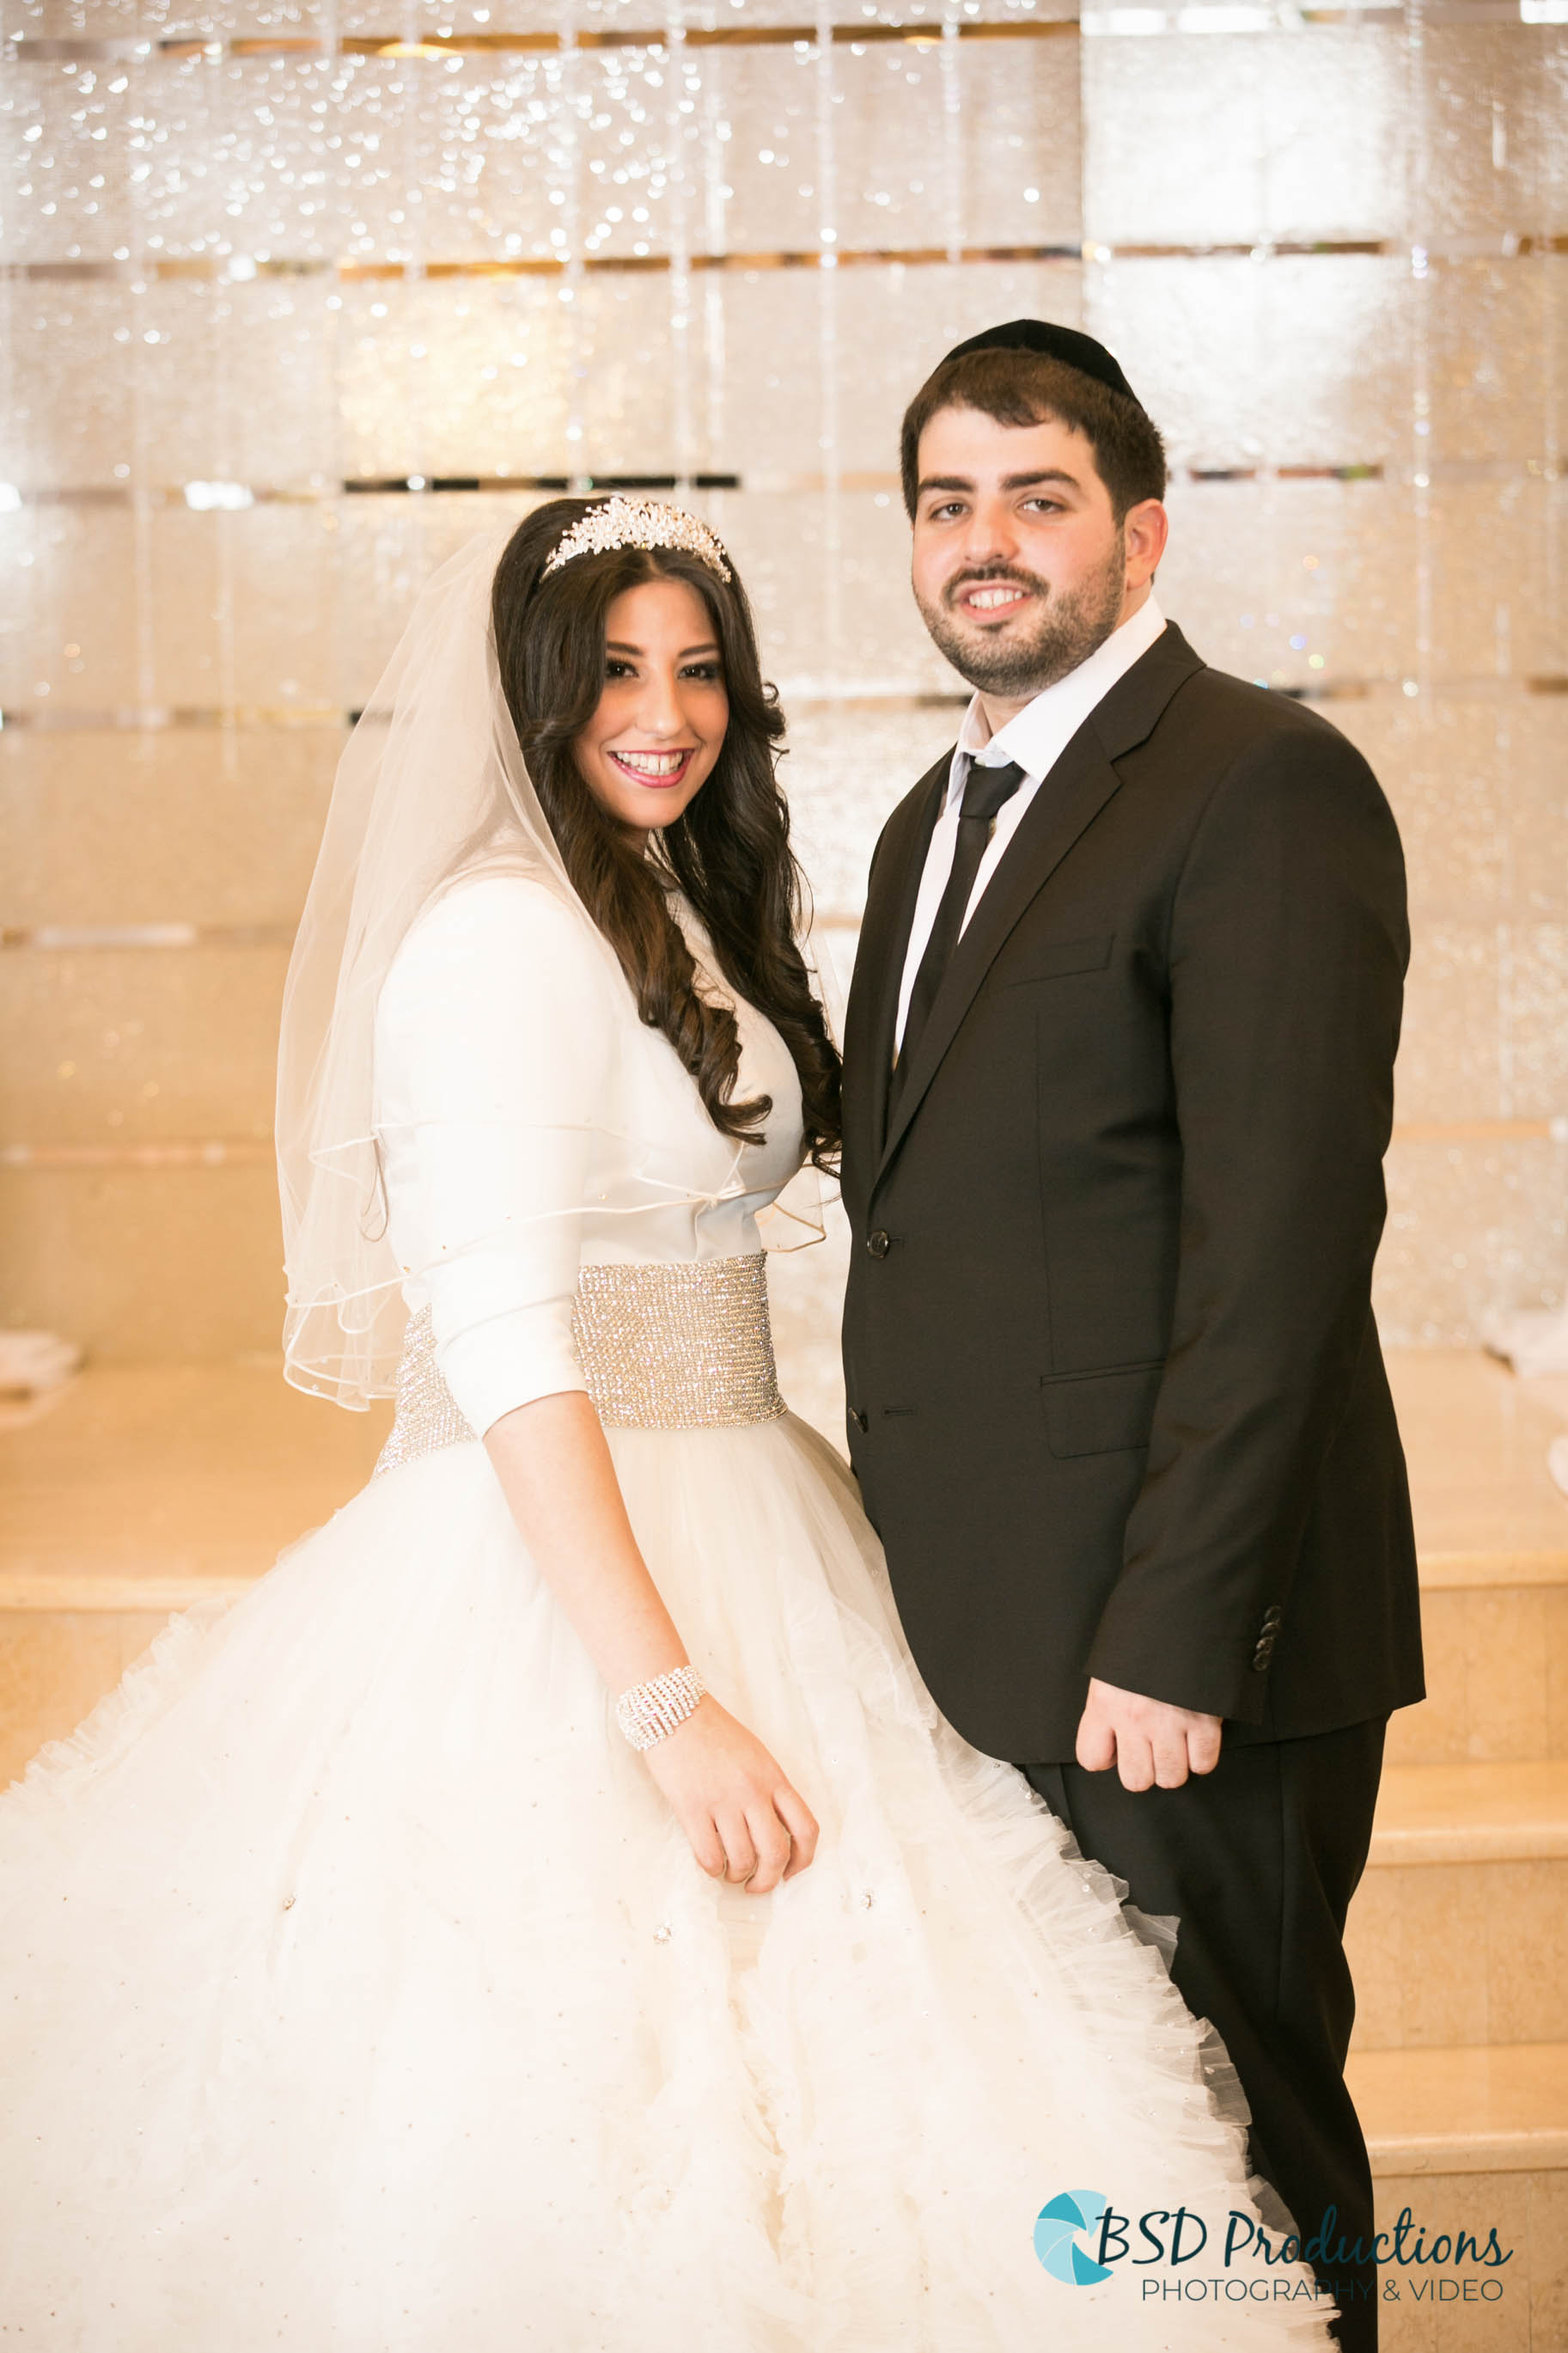 DAV_4733 Wedding – BSD Productions Photography